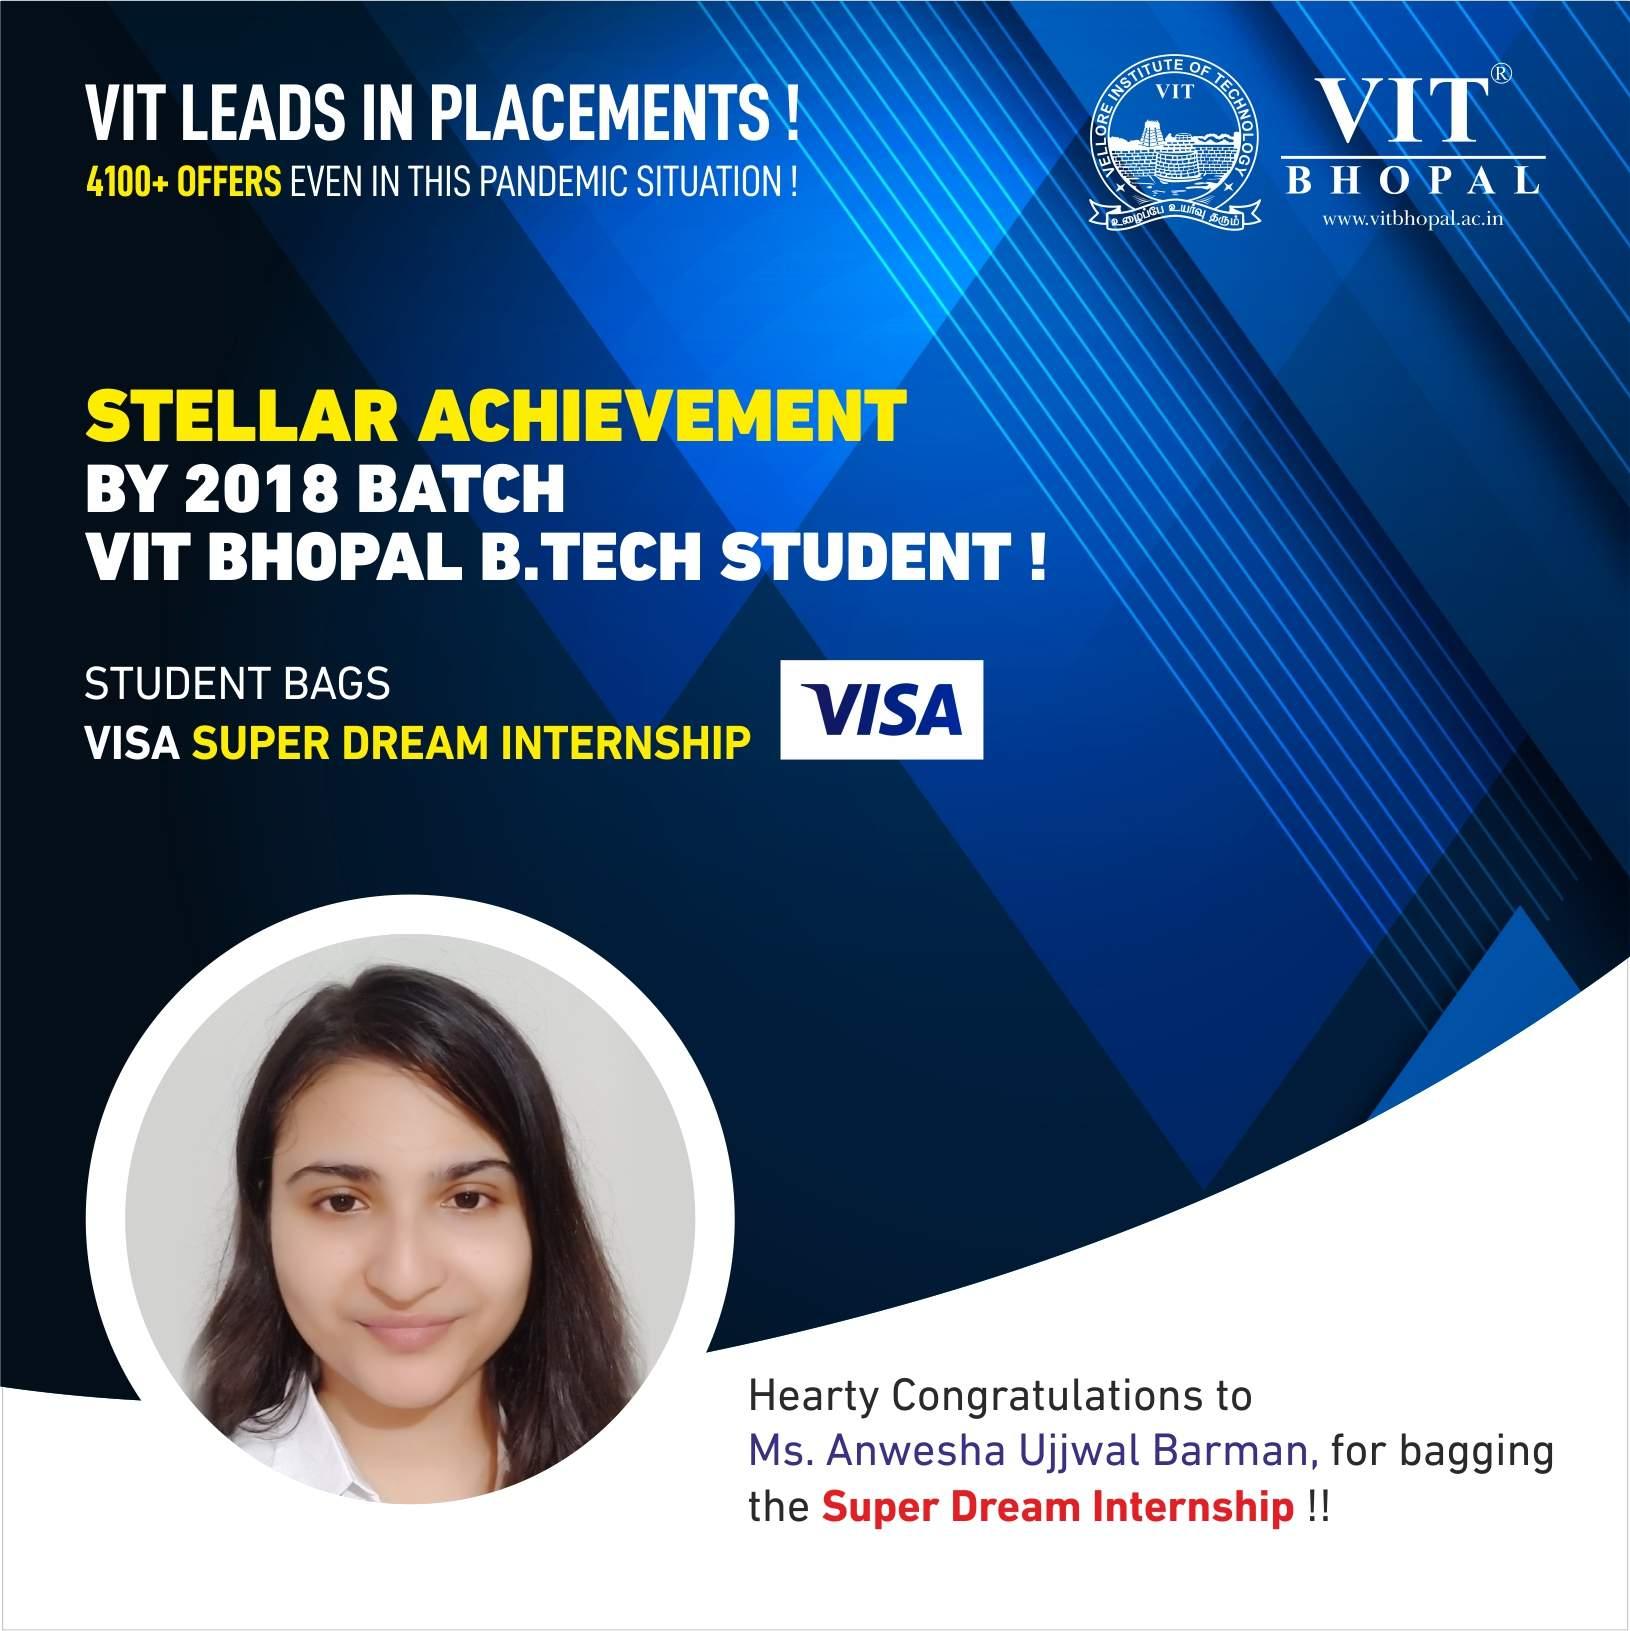 VIT Bhopal  - Best University in Central India -  Internship-Post-Anweshac